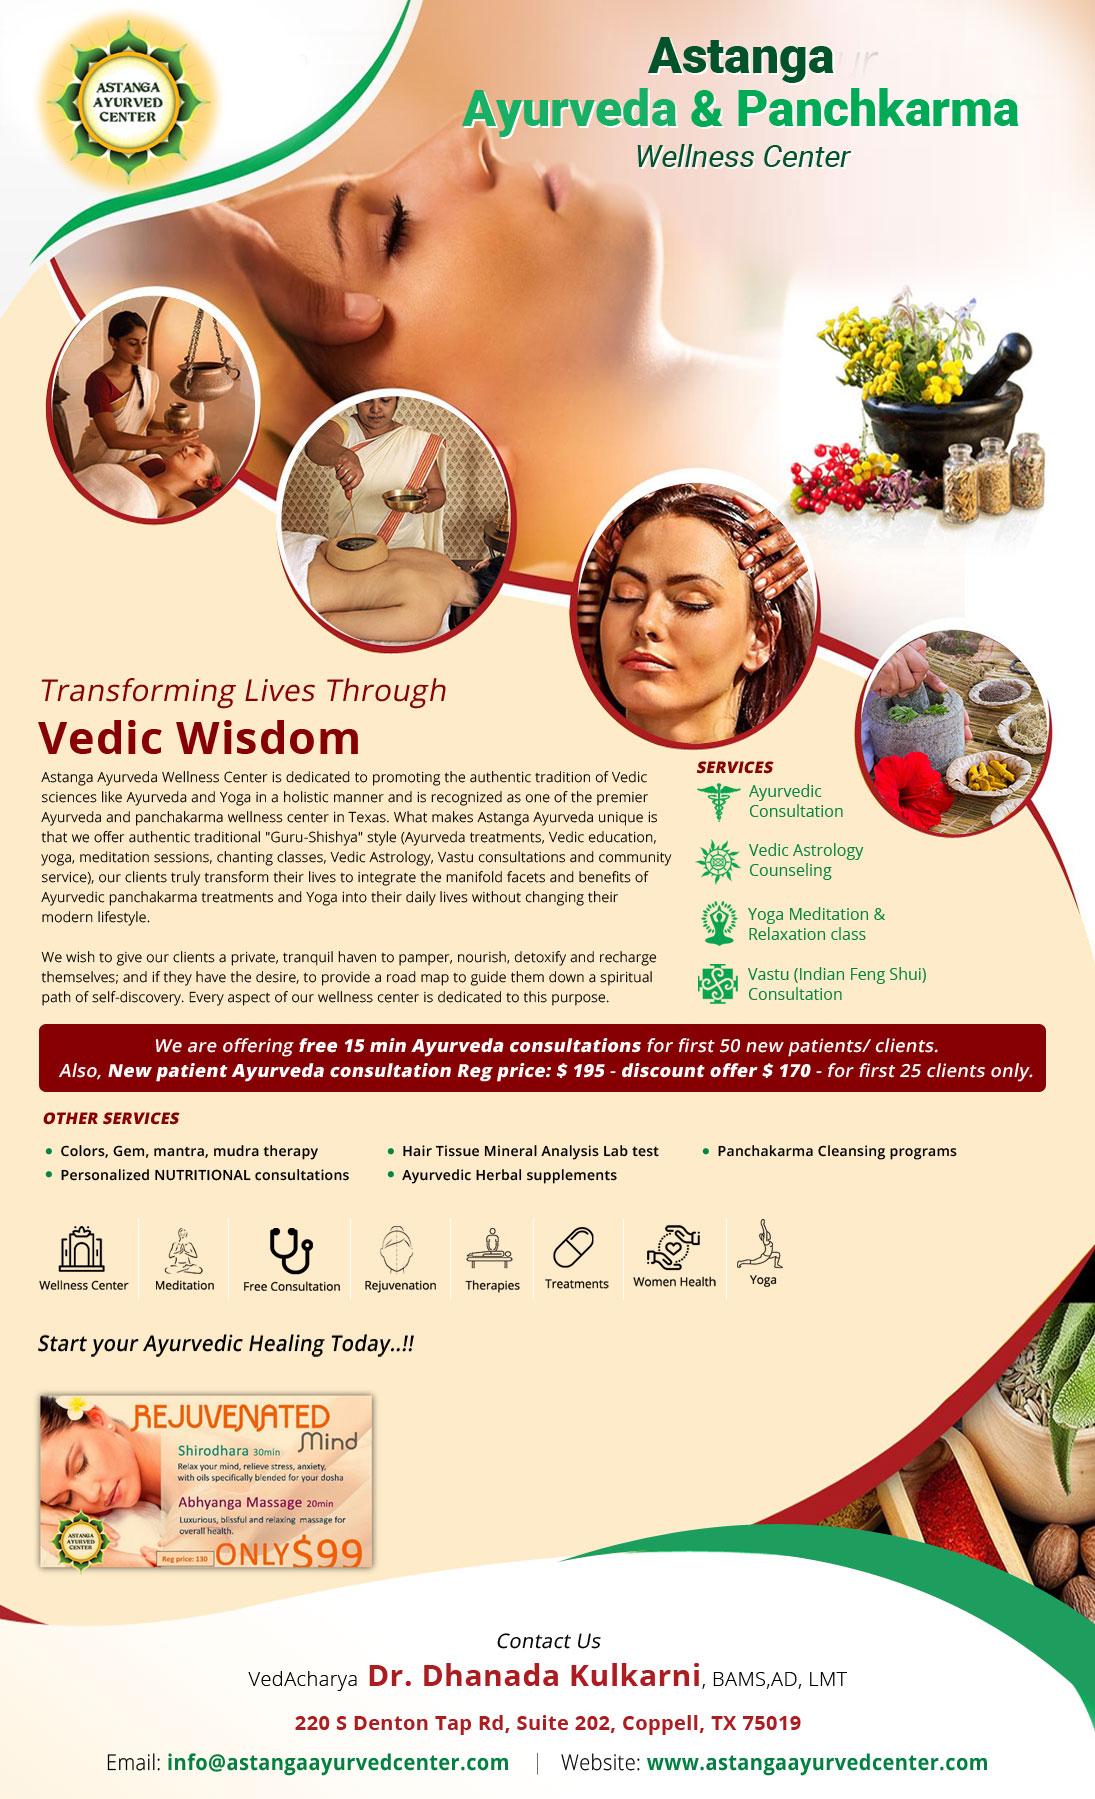 Astanga Ayurveda And Panchkarma Wellness Center - Therapist